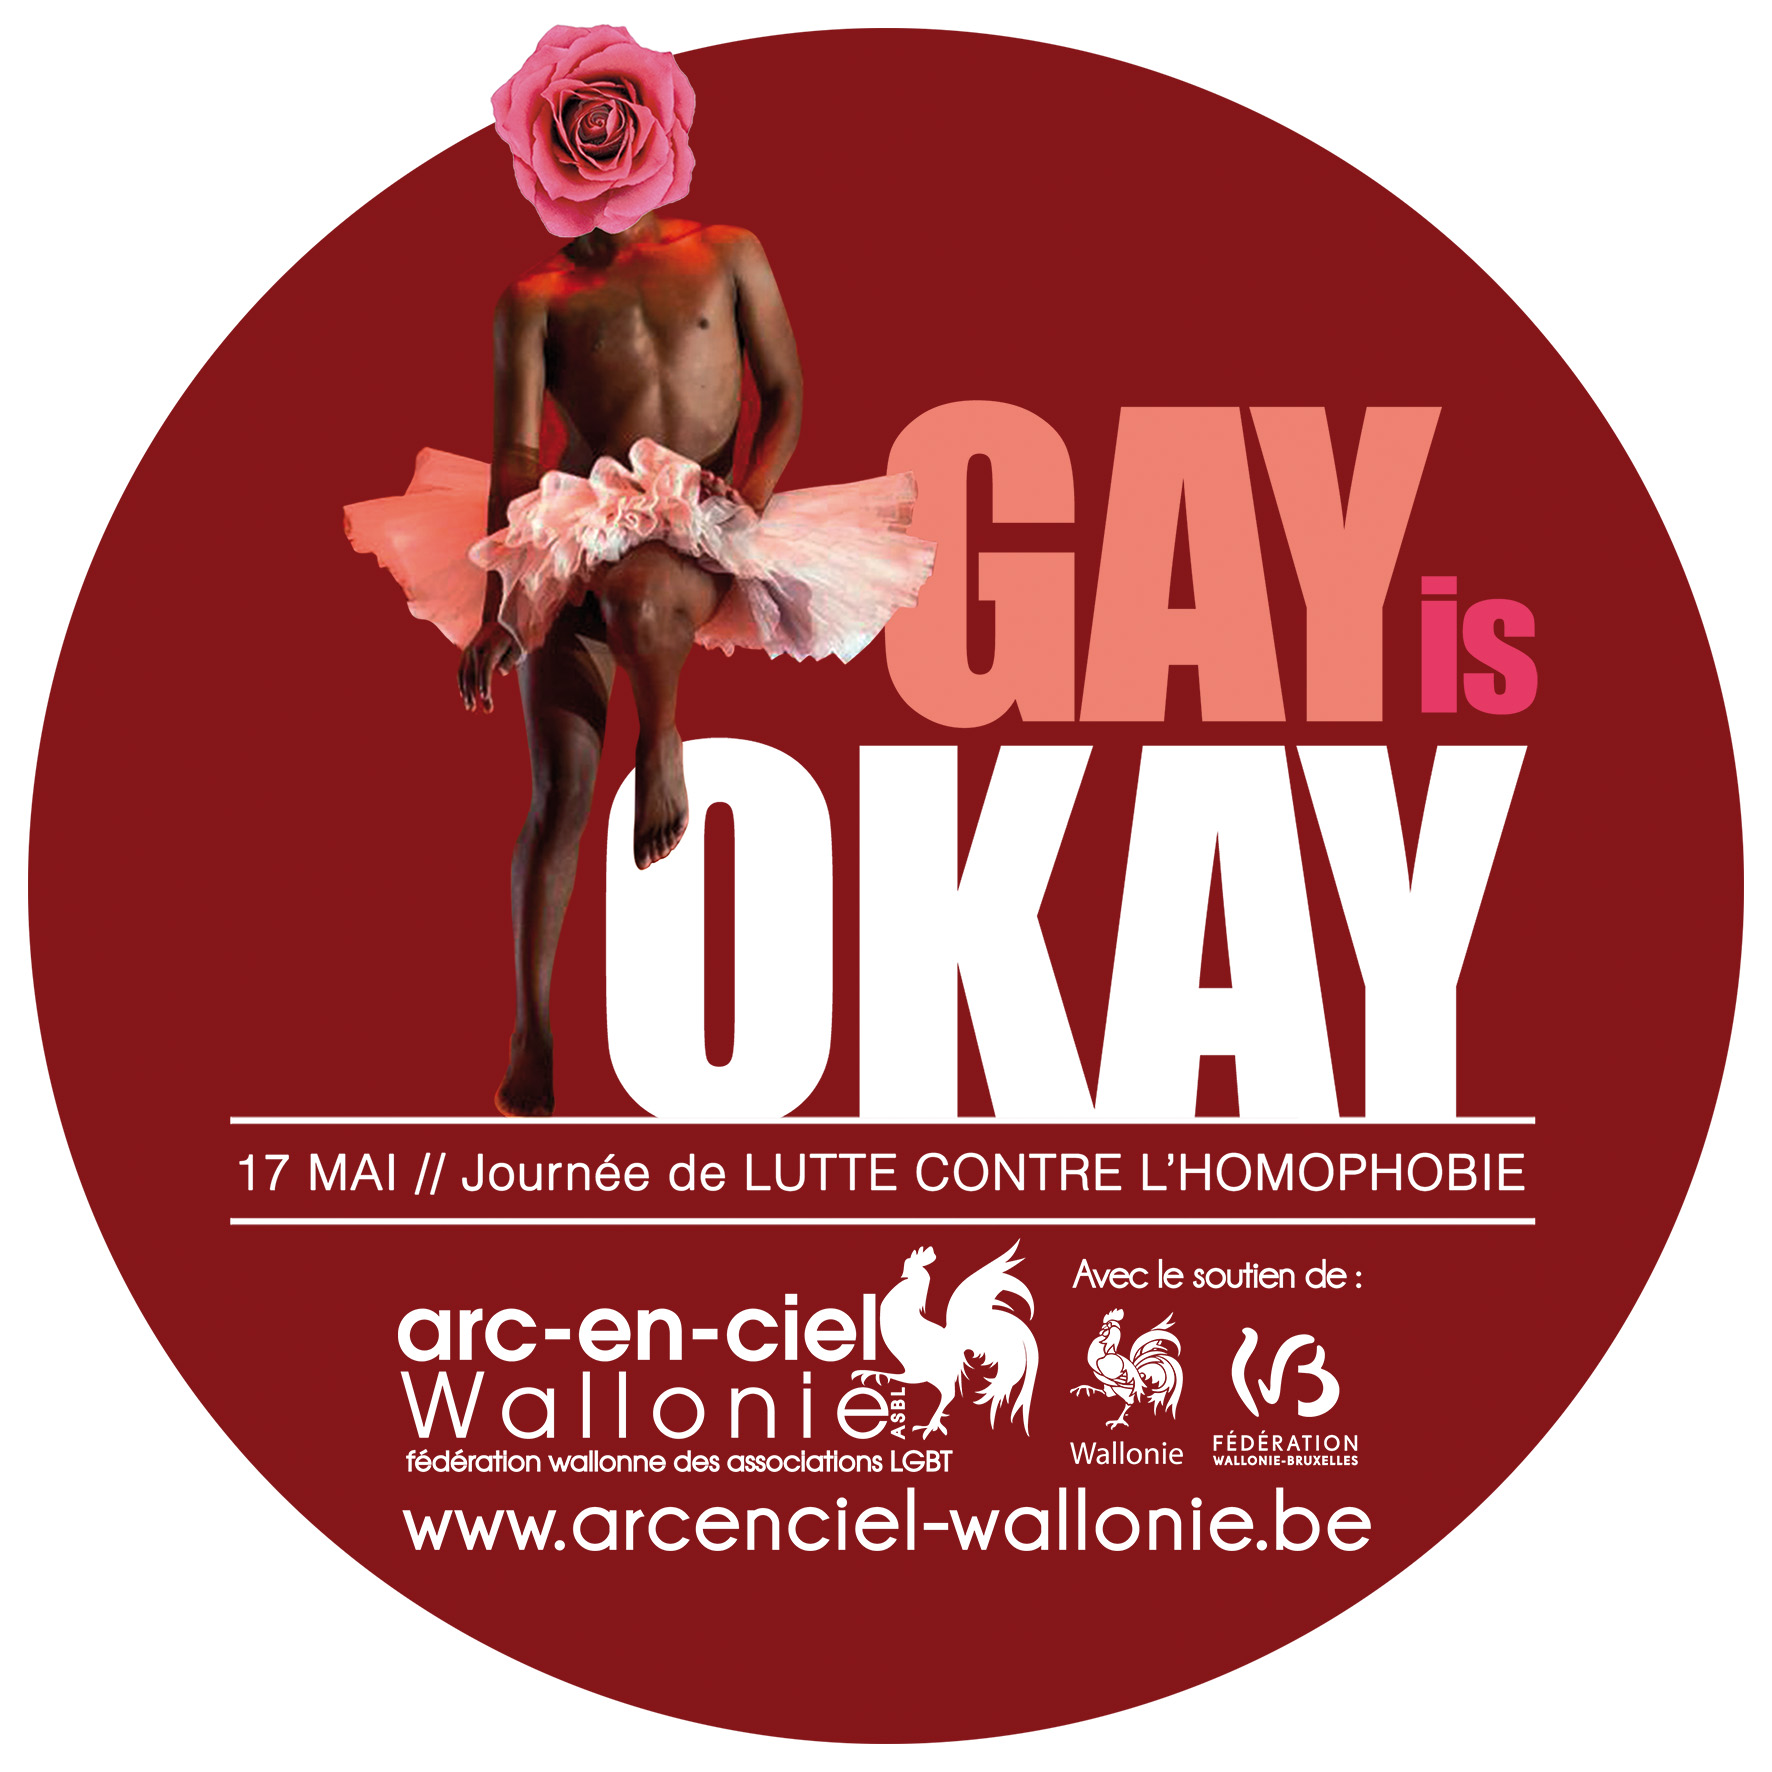 GAYISOKAY-Campagne-ARC-EN-CIEL-AngiePir